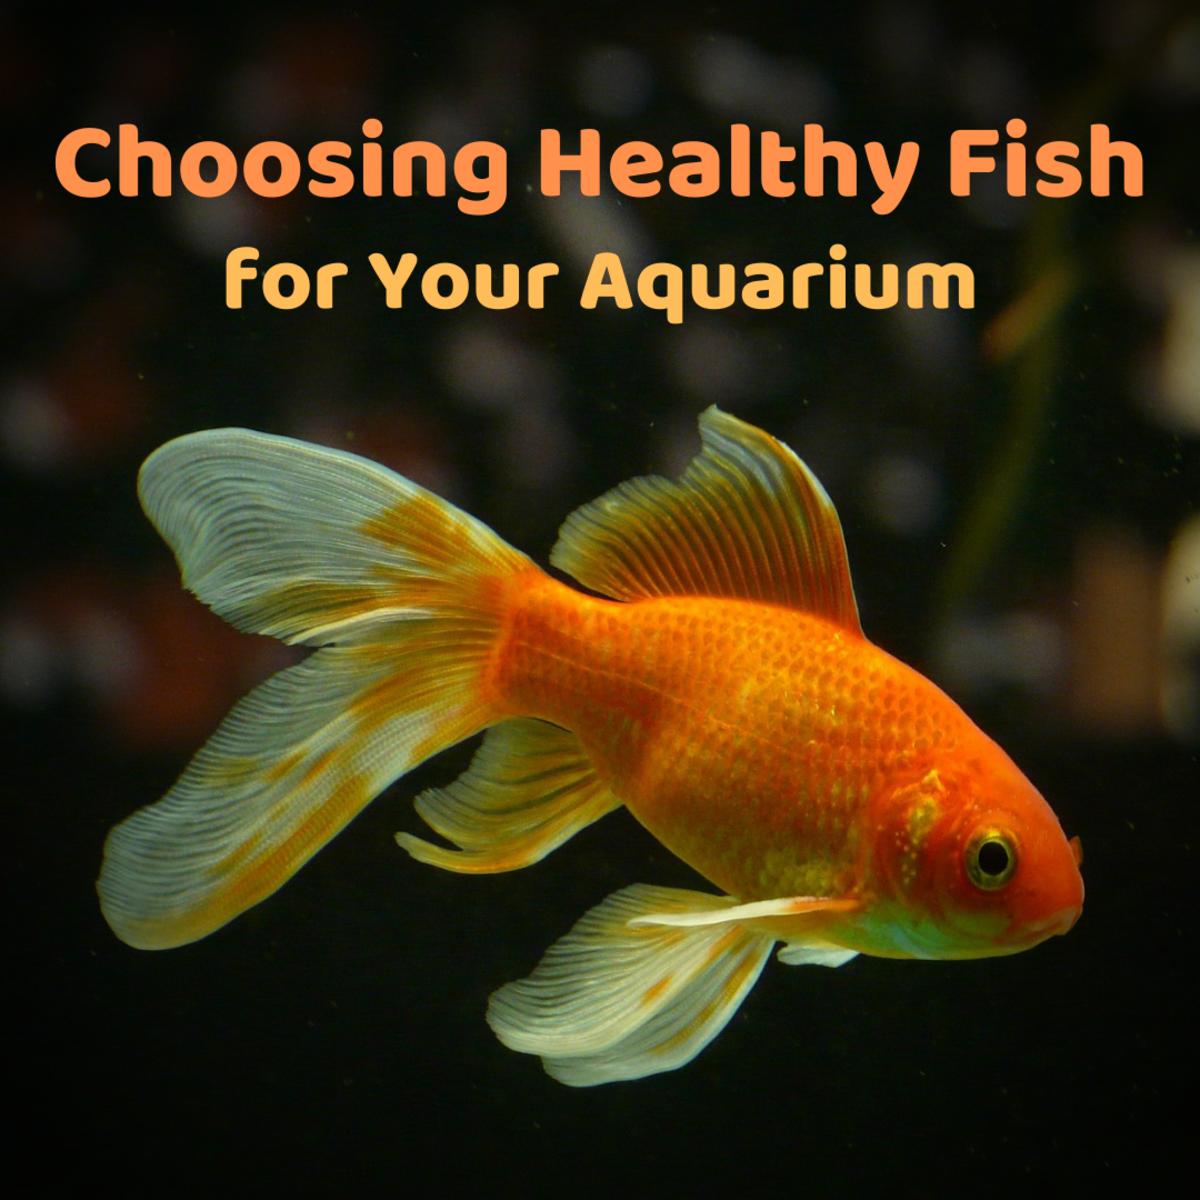 Fish-Buying Tips: How to Choose Healthy Aquarium Fish